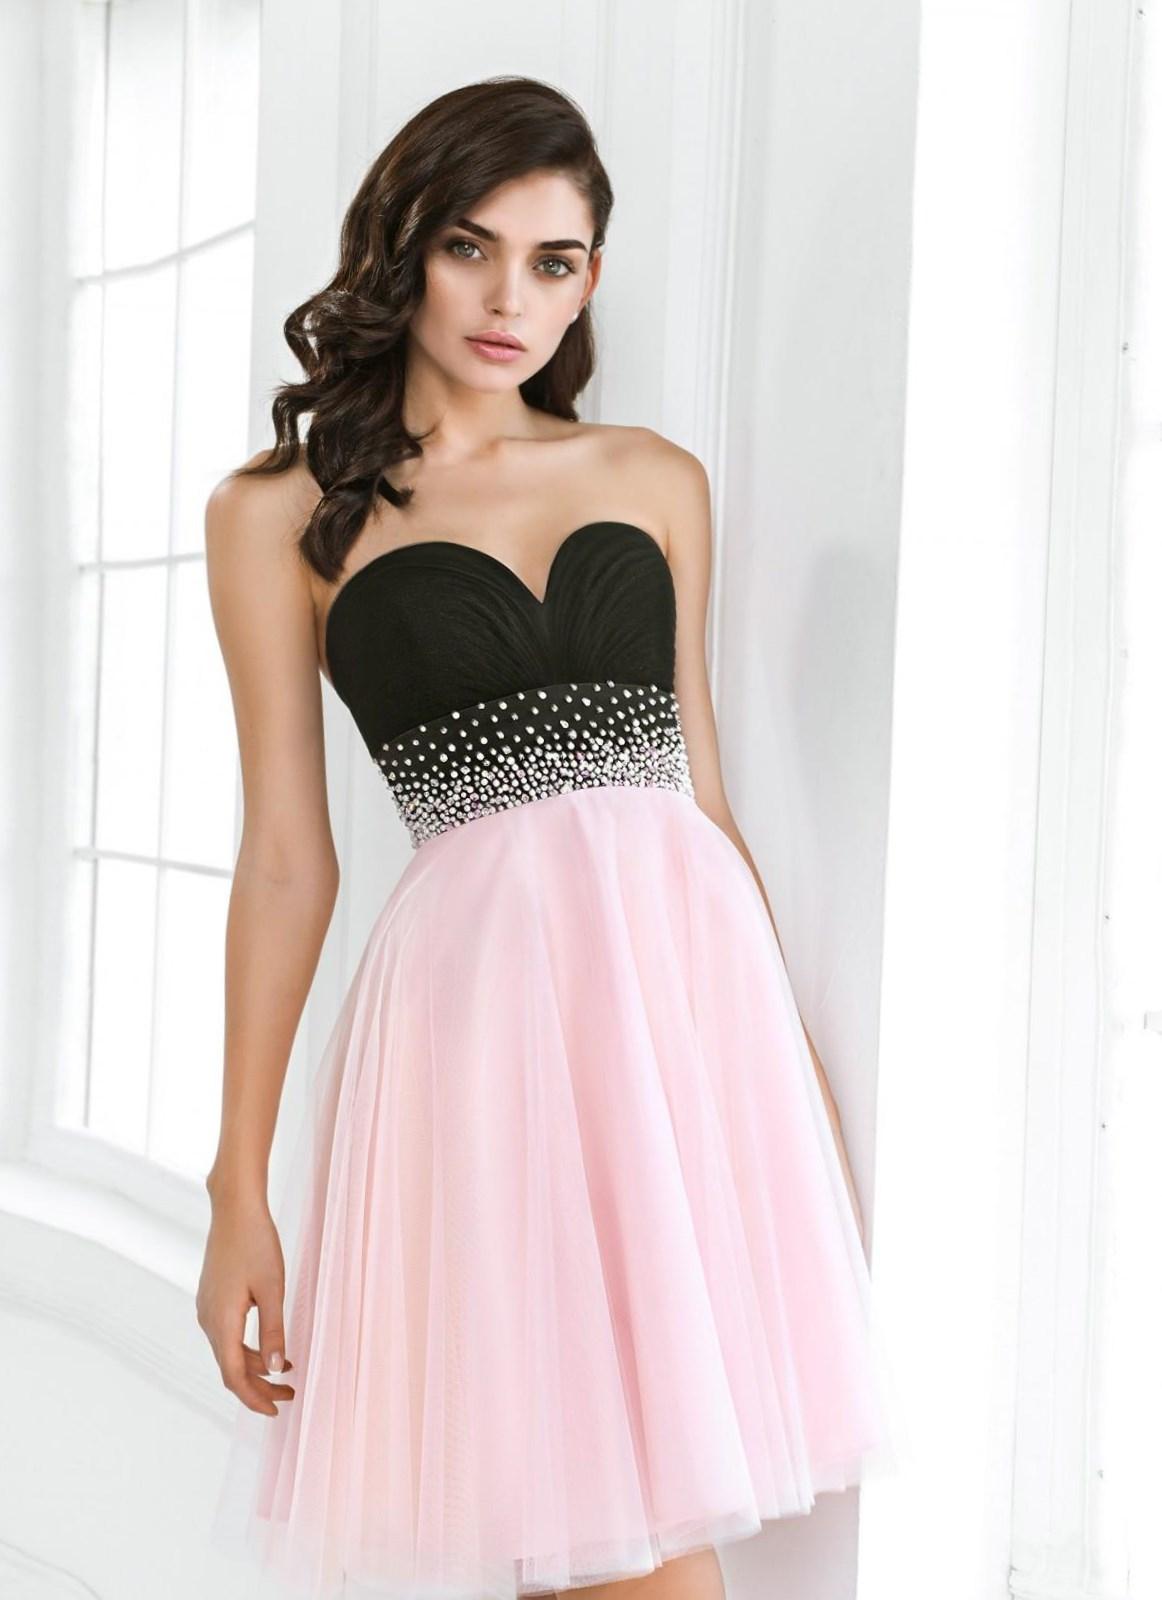 f400f64f5887 Όμορφα σύντομα φορέματα. Μια επιλογή από τα πιο μοντέρνα σύντομα ...